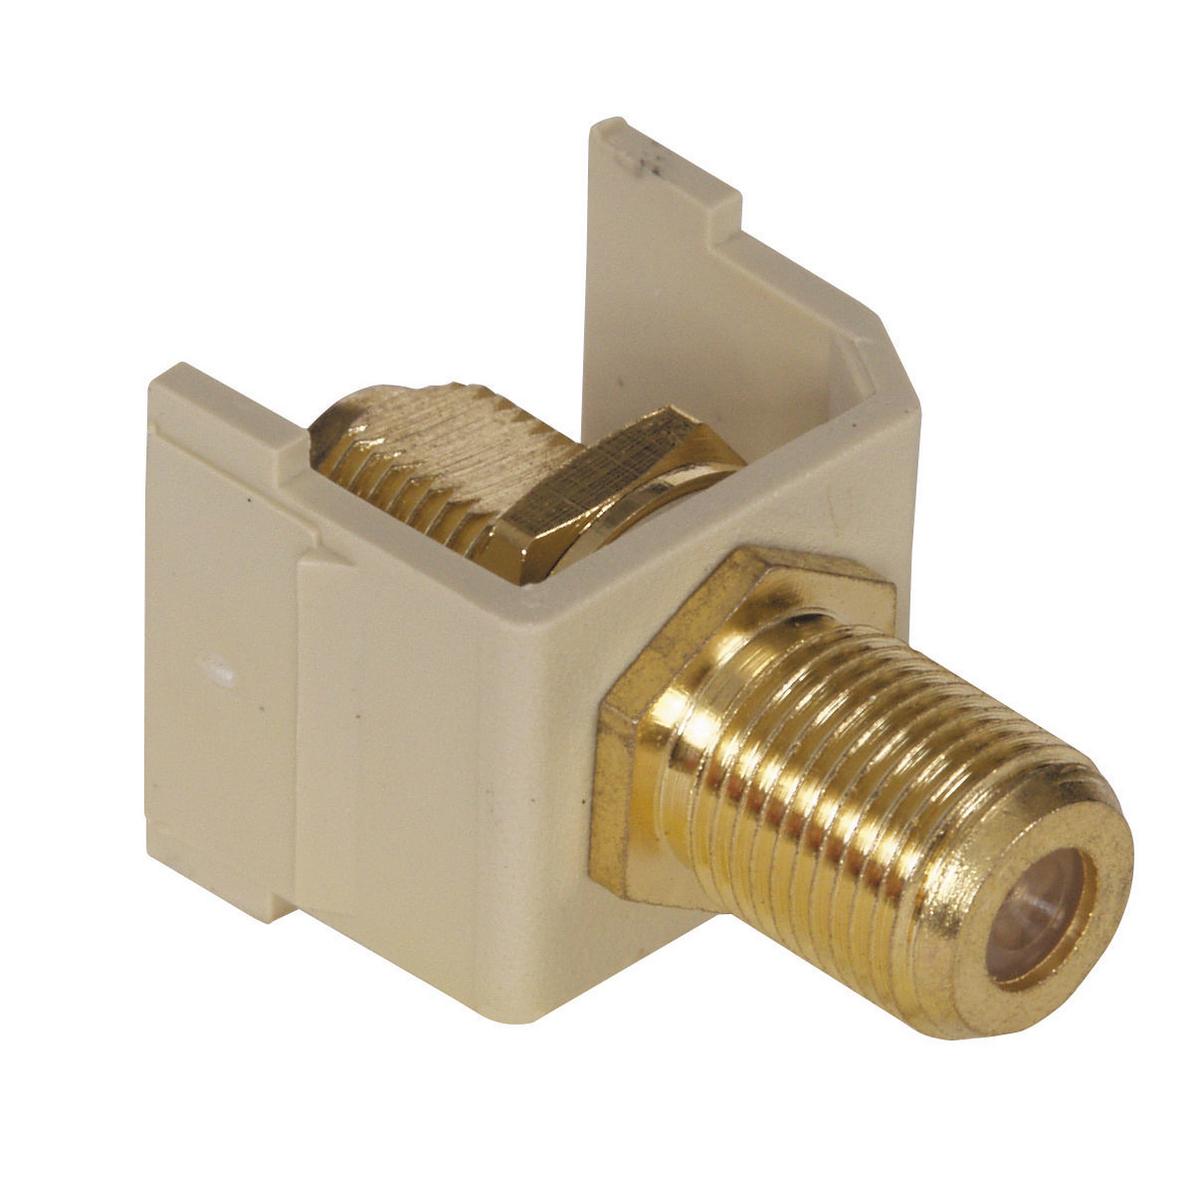 HUBPR SFF3GEI SNAP-FIT, 3GHZ, GOLD F CONN, EI 3Ghz f-connector insert electric ivory